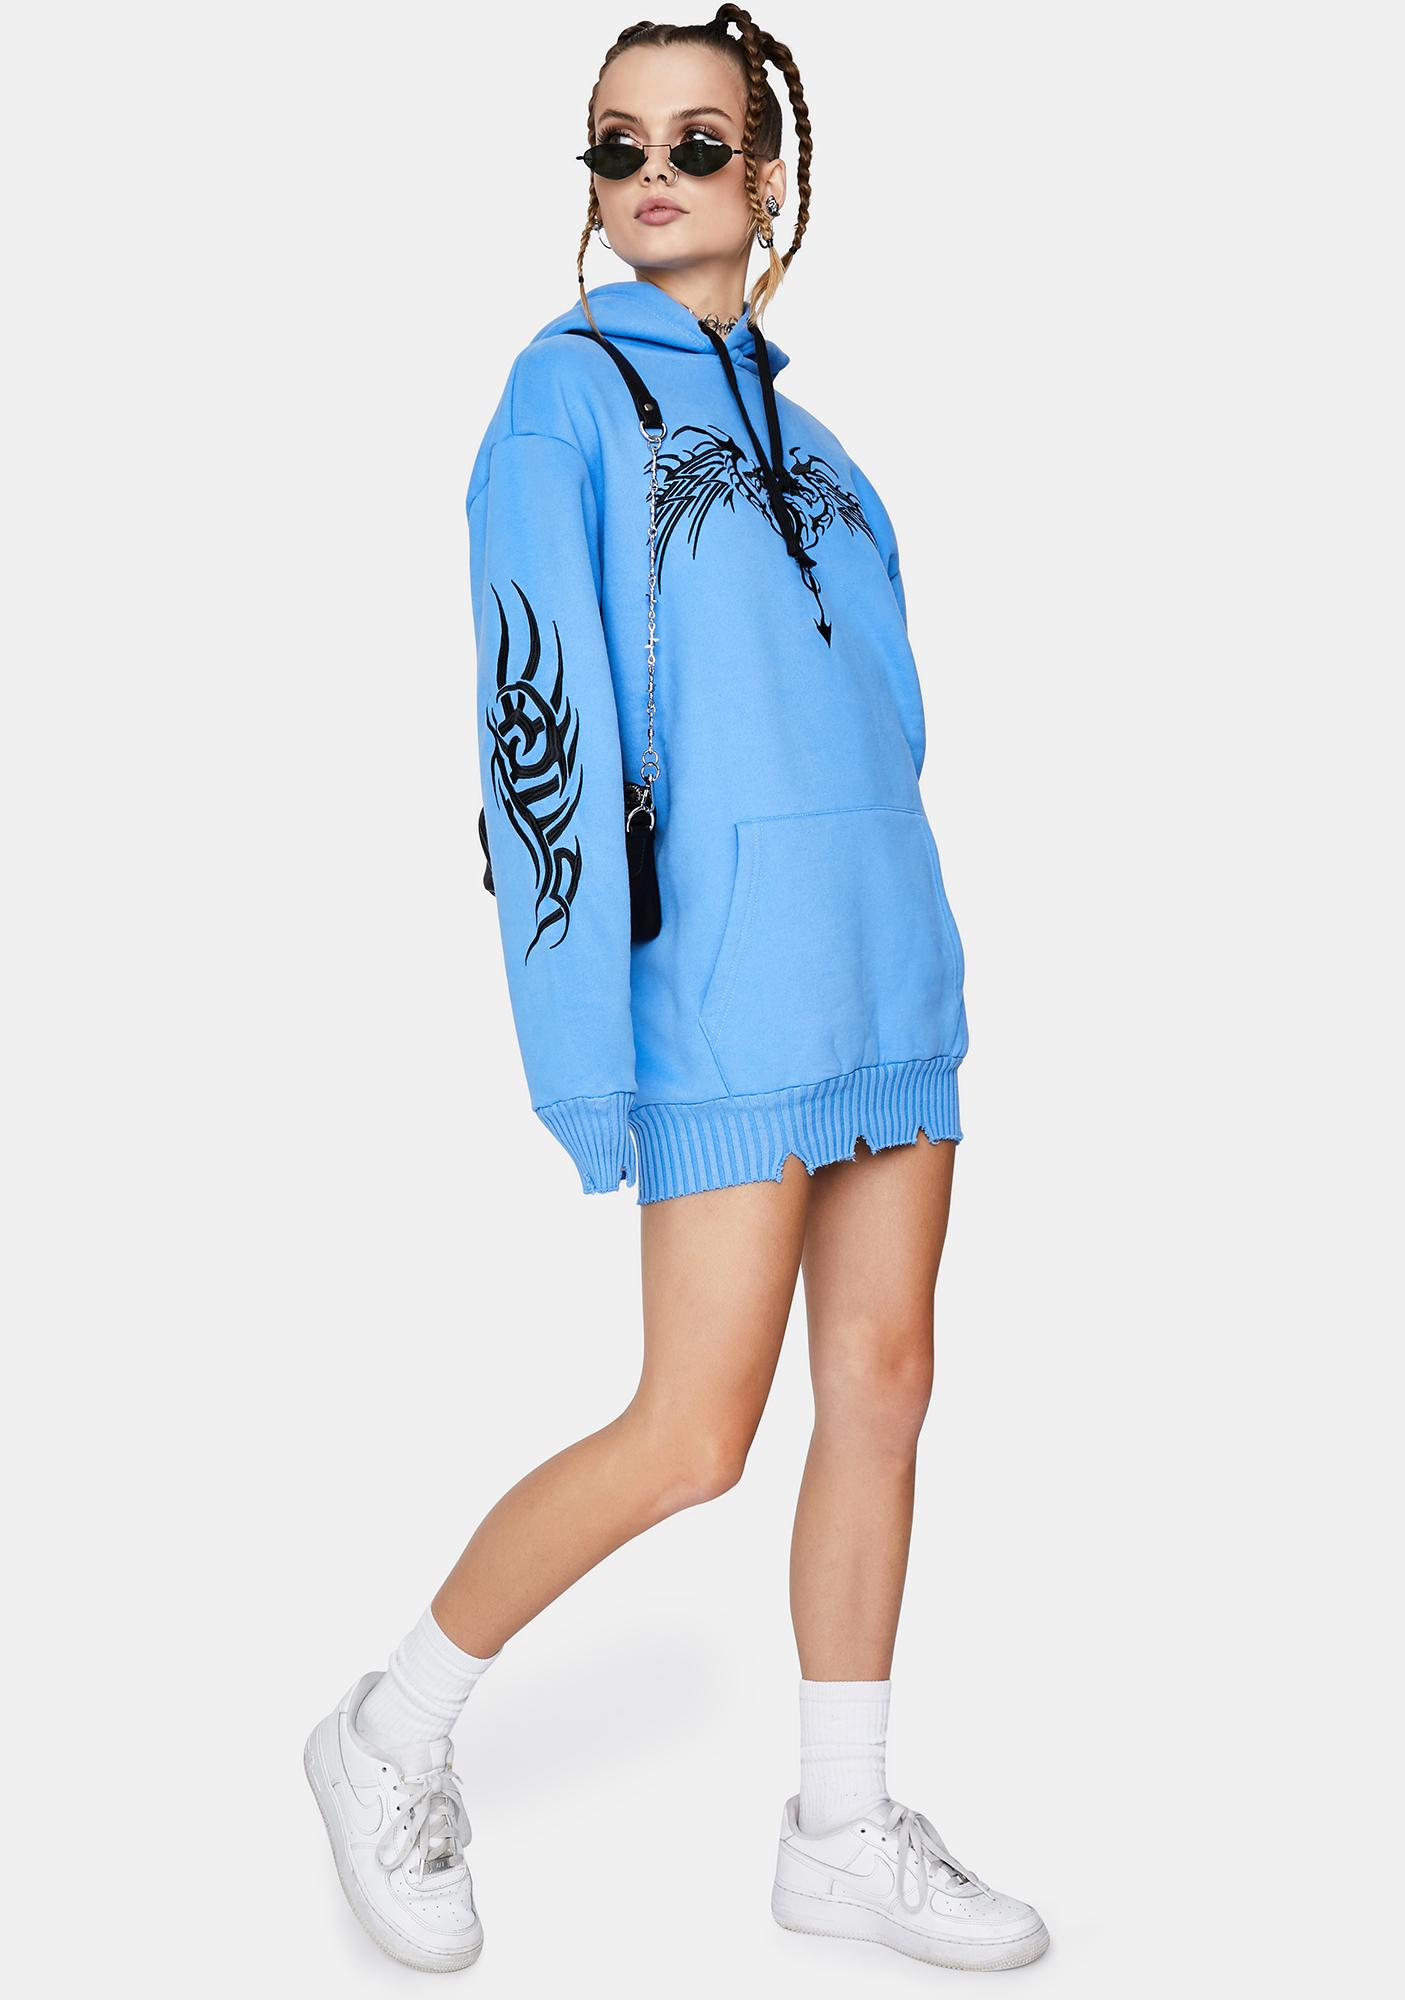 Current Mood Indigo Looking For Danger Hoodie Dress